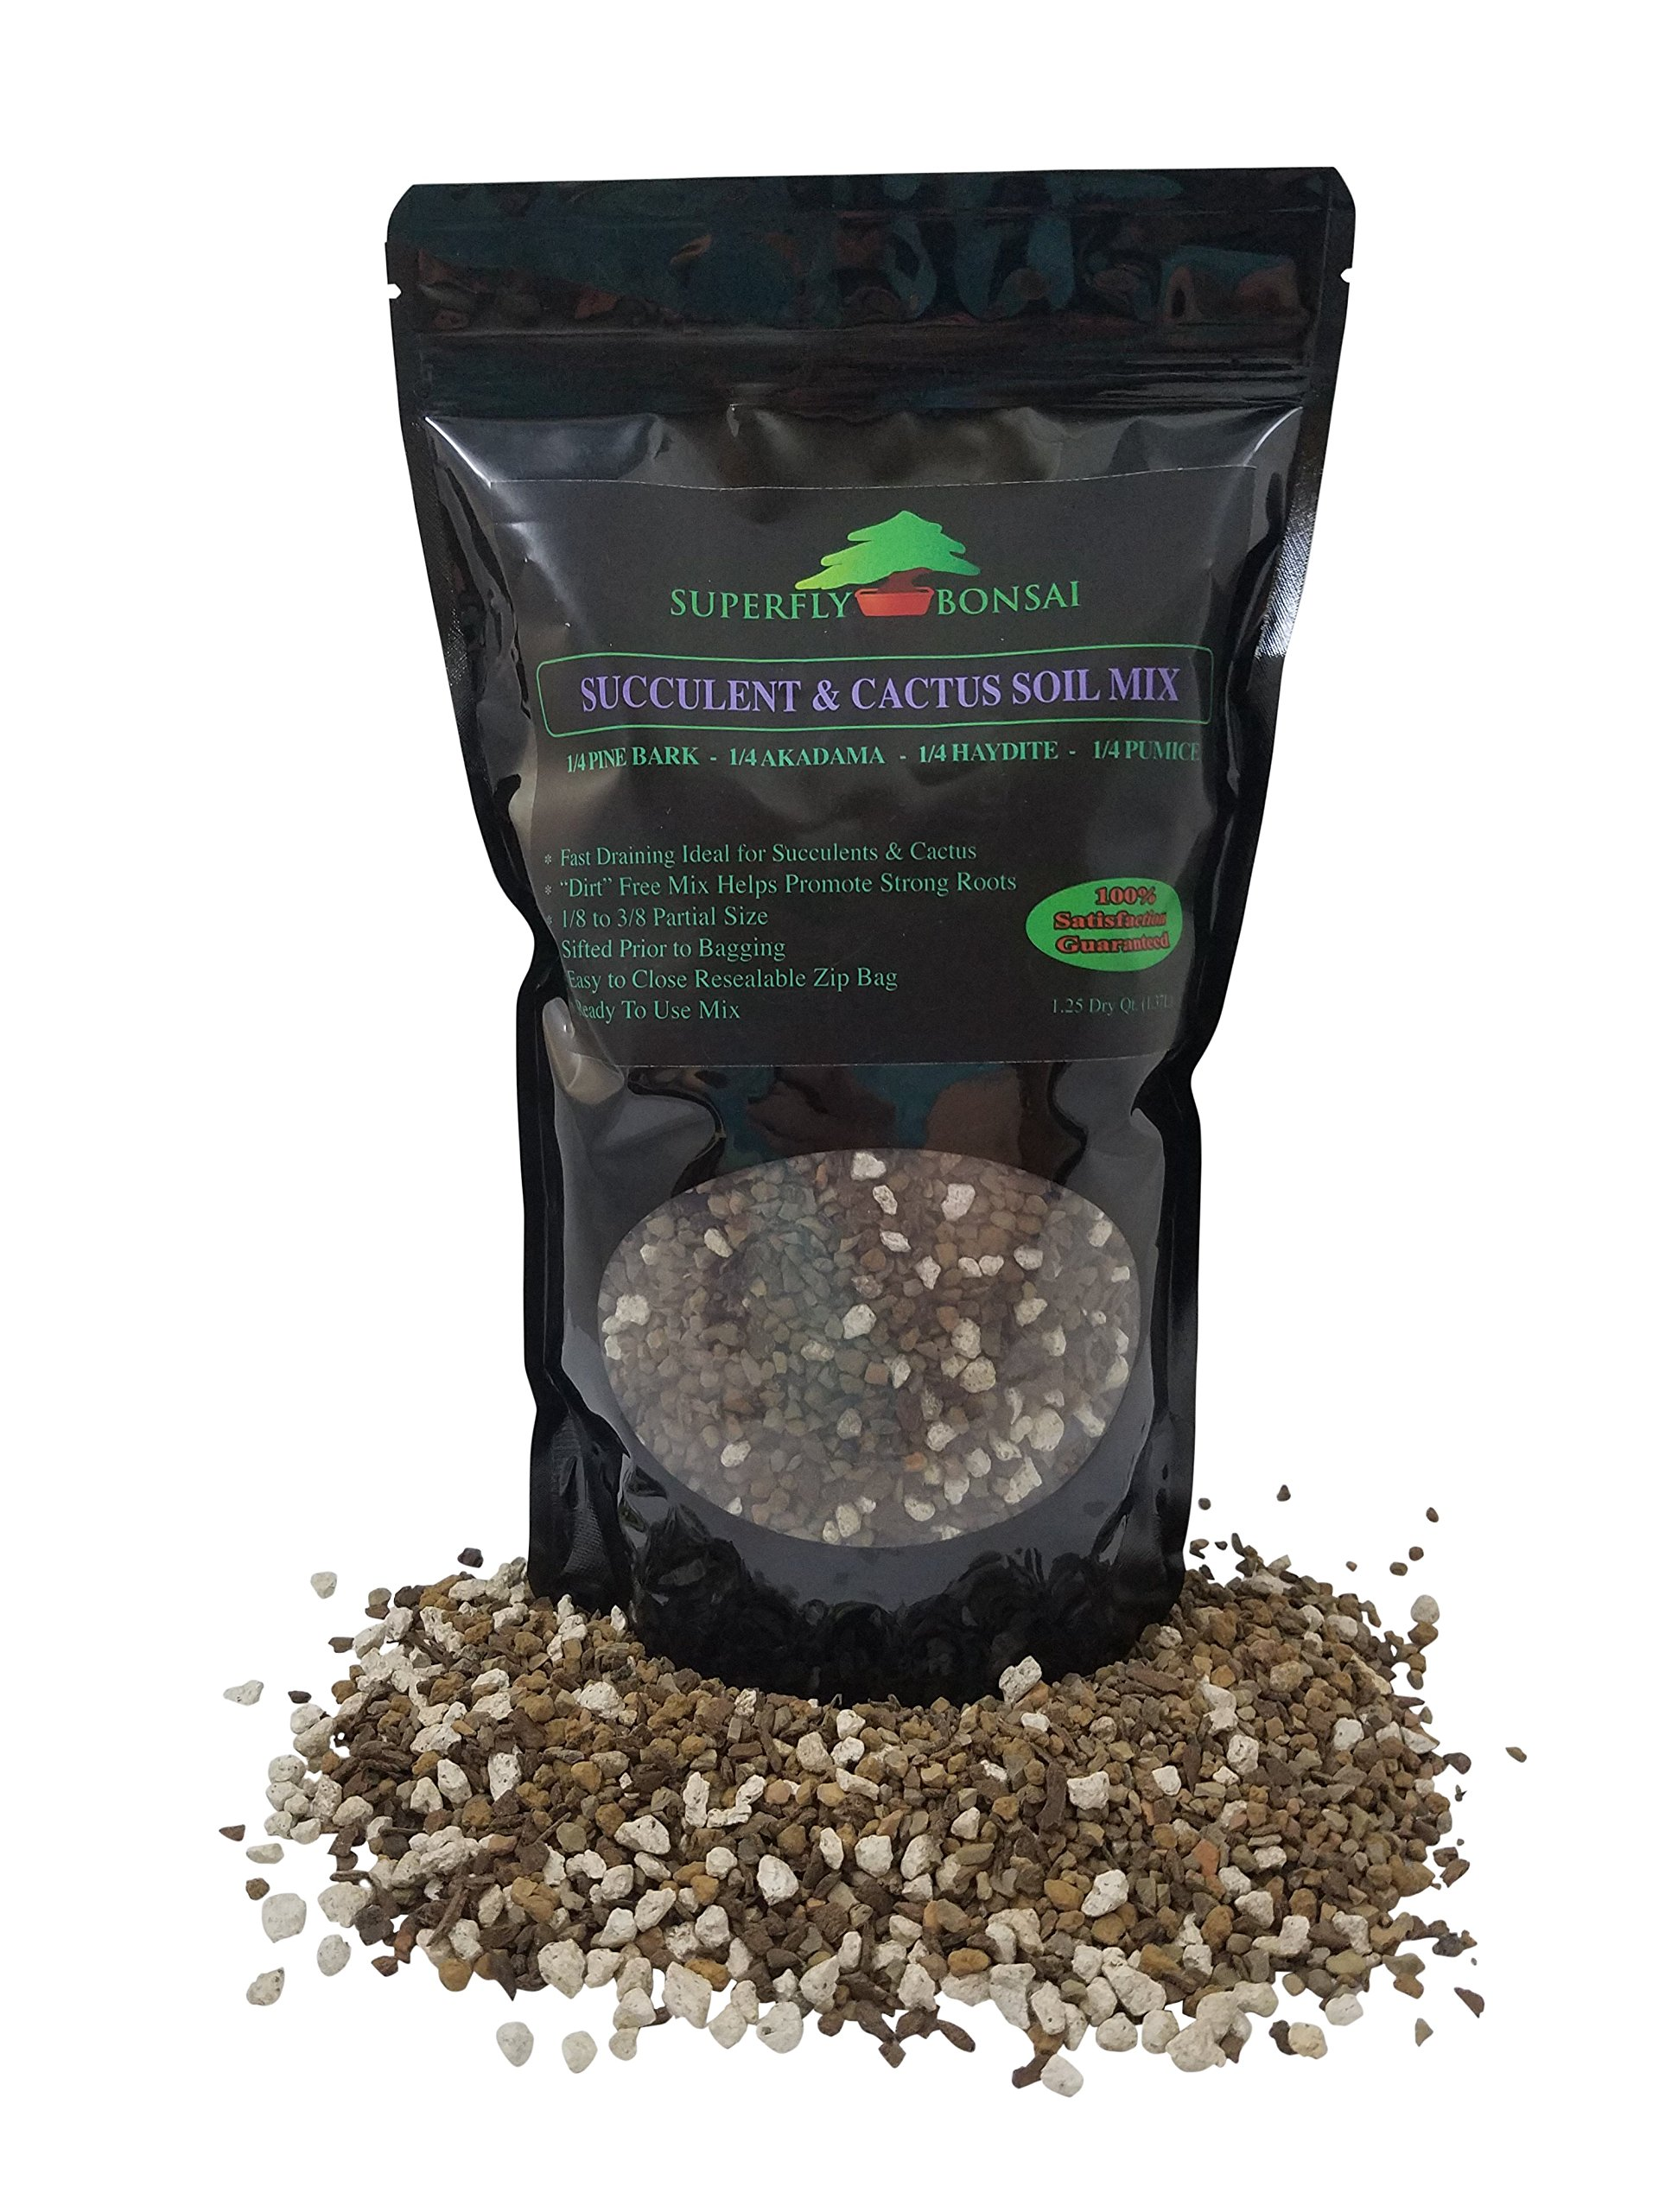 Succulent & Cactus Soil Mix - Pre-Mixed Fast Draining Blend